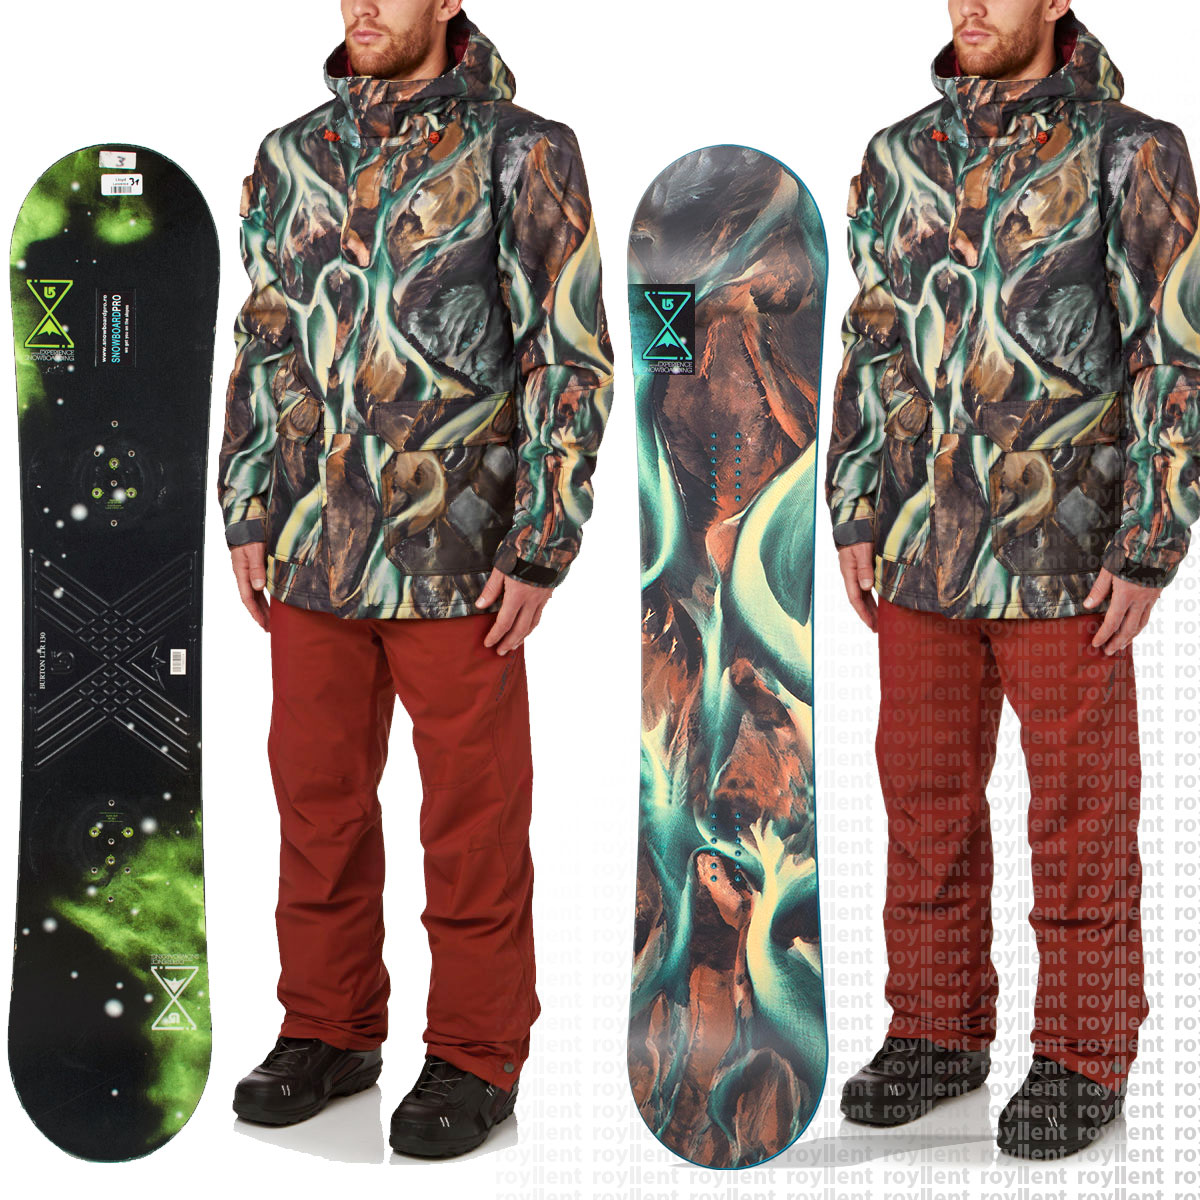 o-neill-snowboard-jackets-o-neill-ginga-snowboard-jacket-red-aop-3